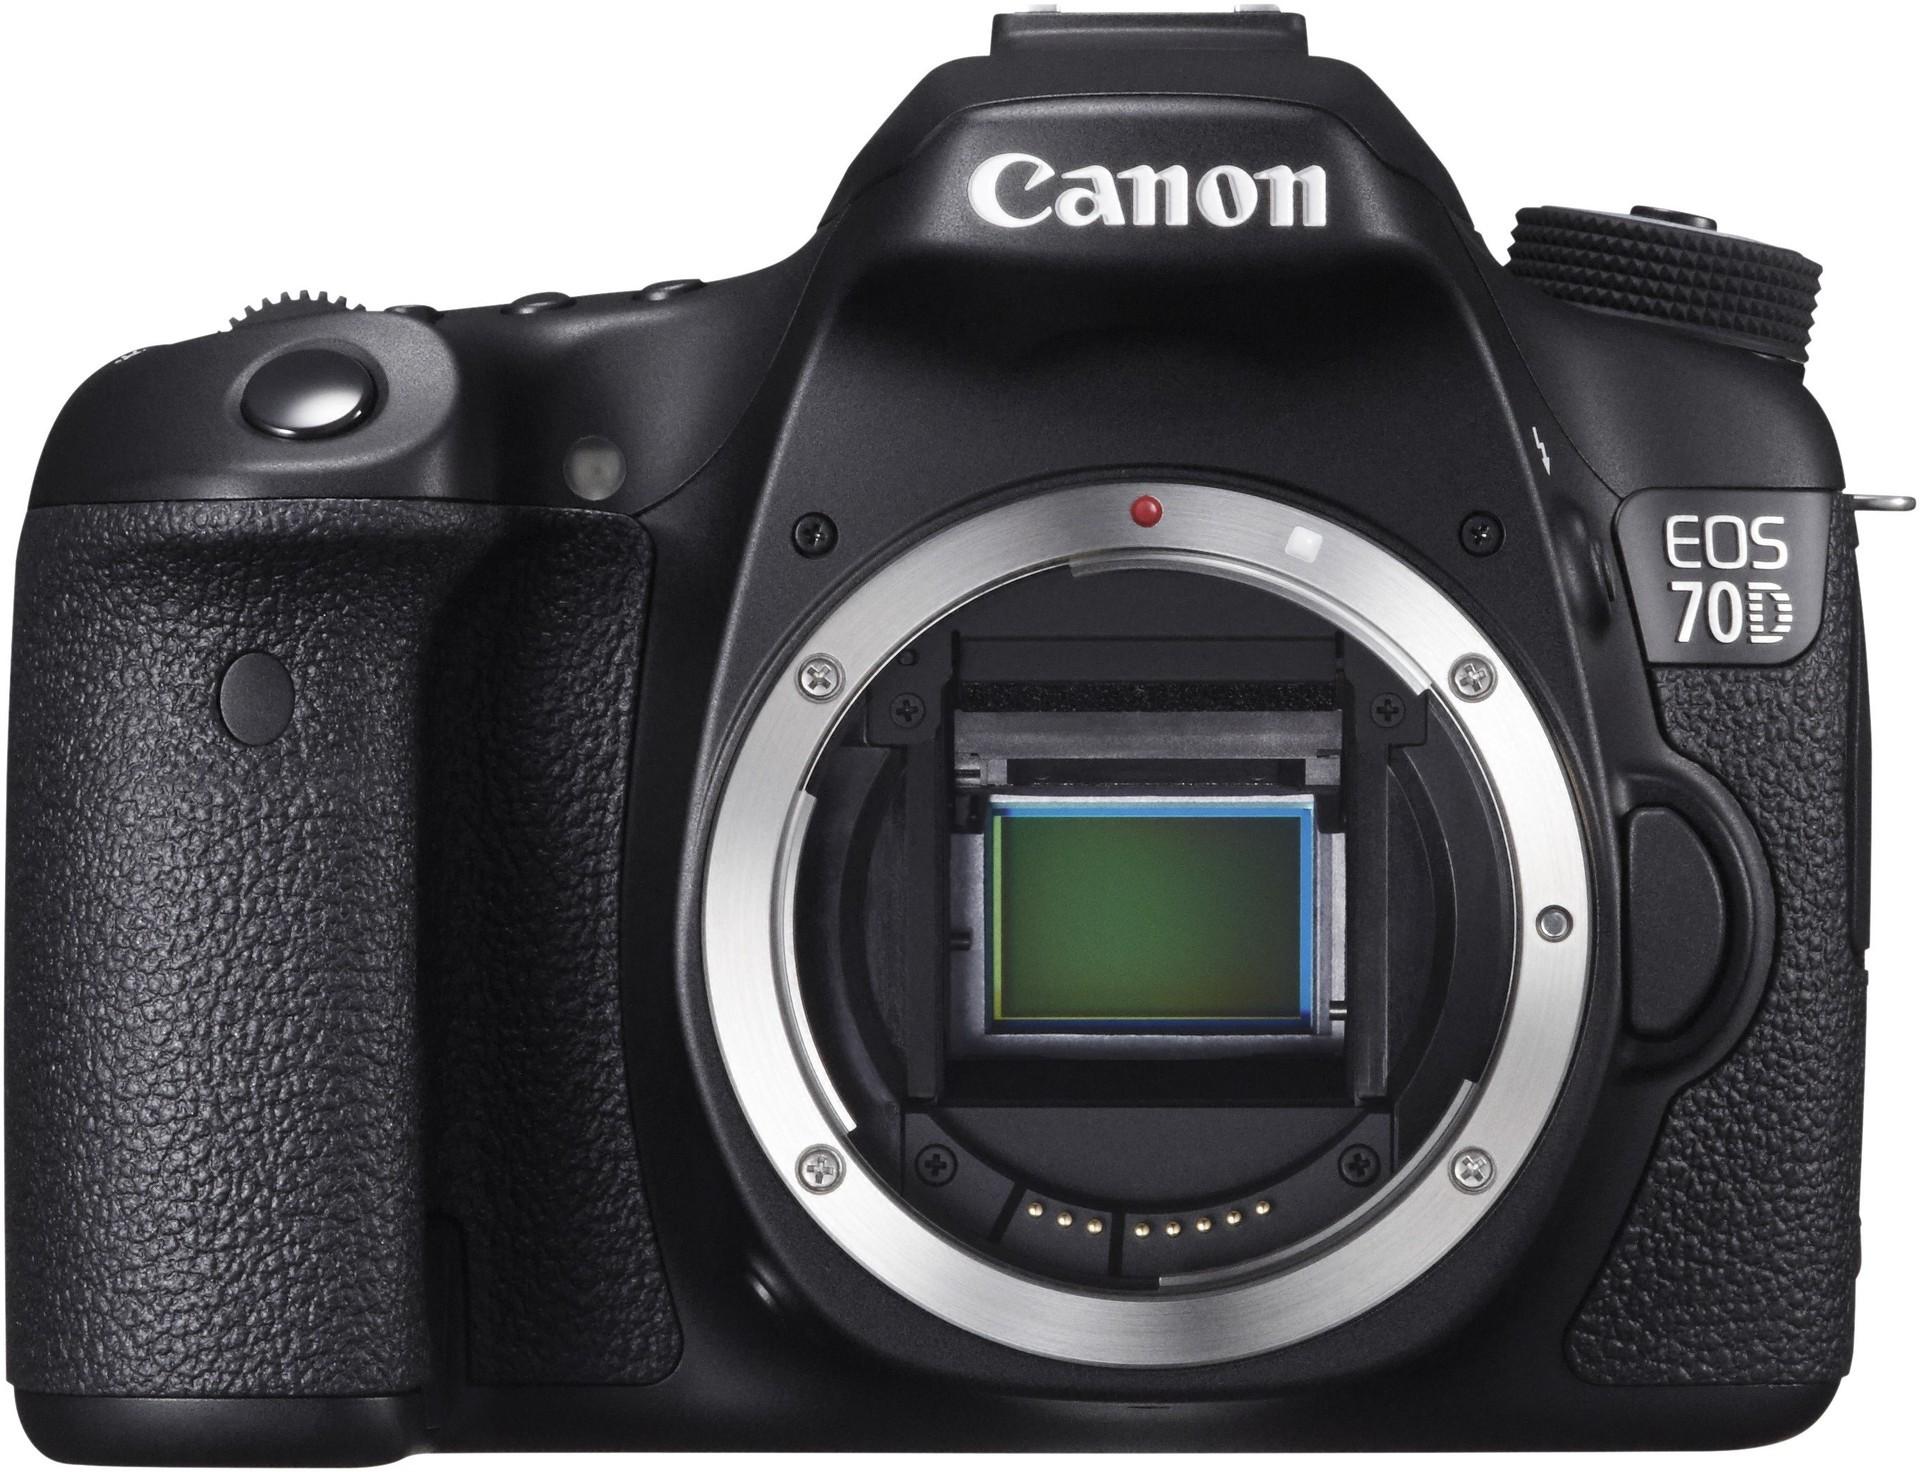 canon-eos-70d-dslr-camera-body-only-black-.jpg